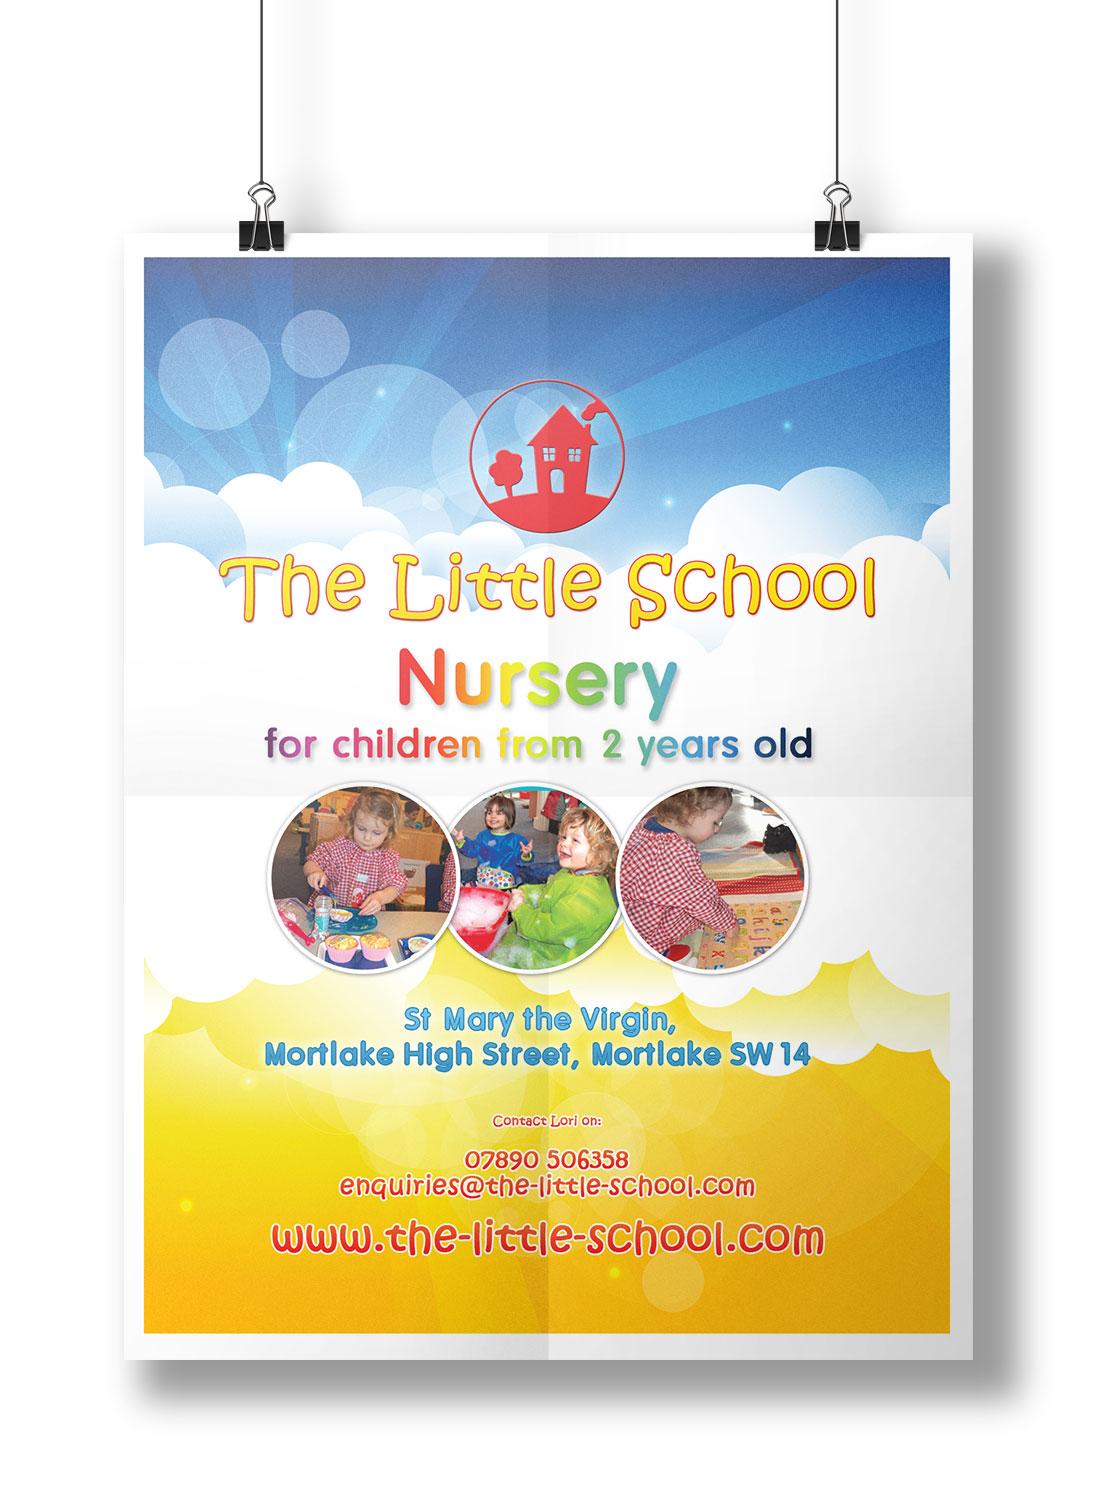 Nursery School Poster Design